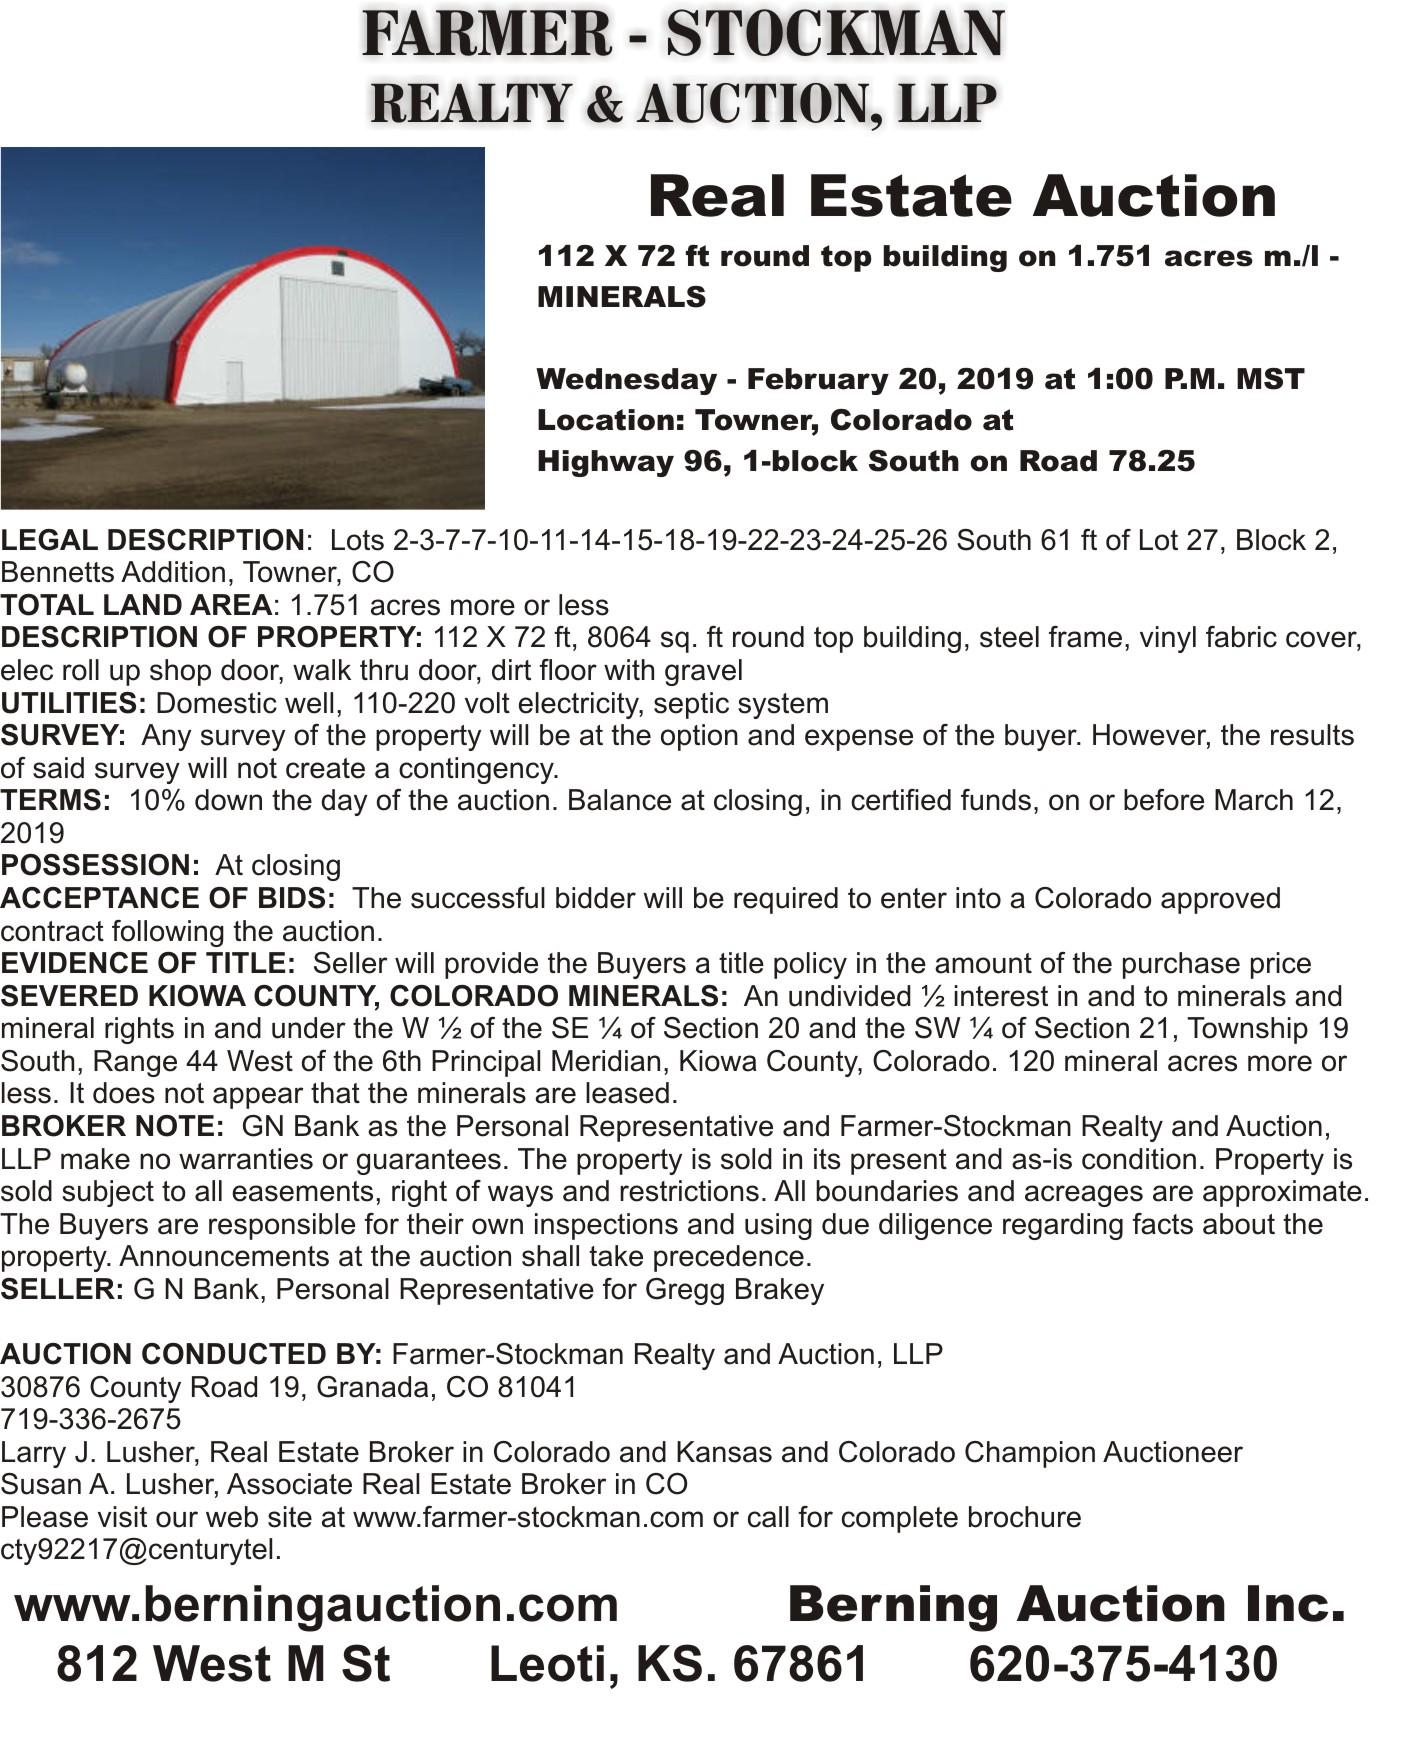 AD 2019 Berning Auction - Brakey 2